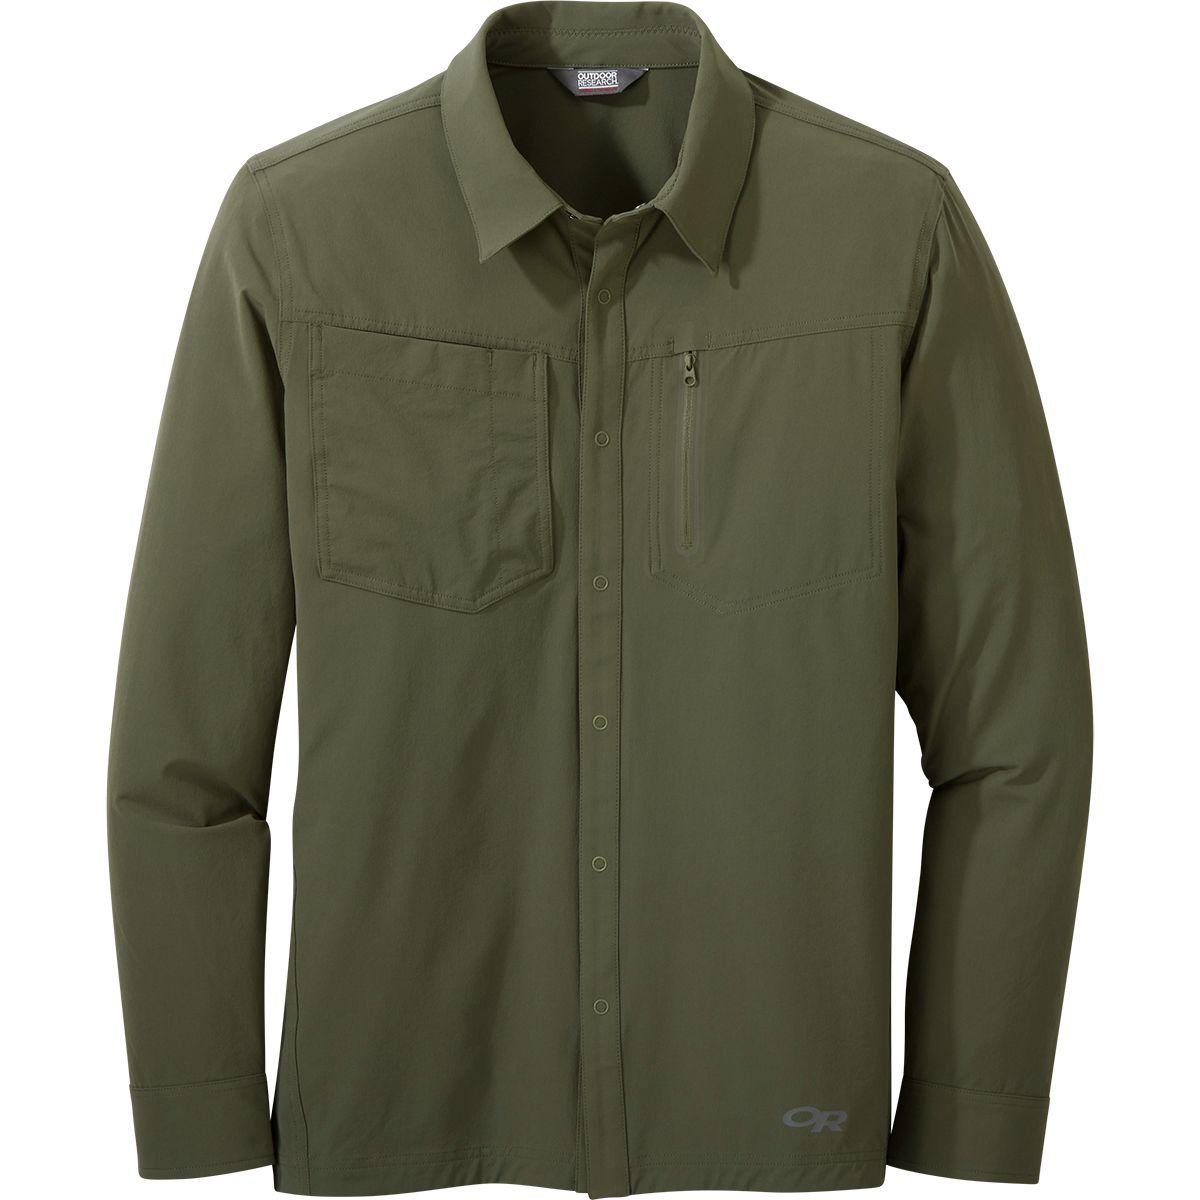 Outdoor Research Ferrosi Shirt Jacket